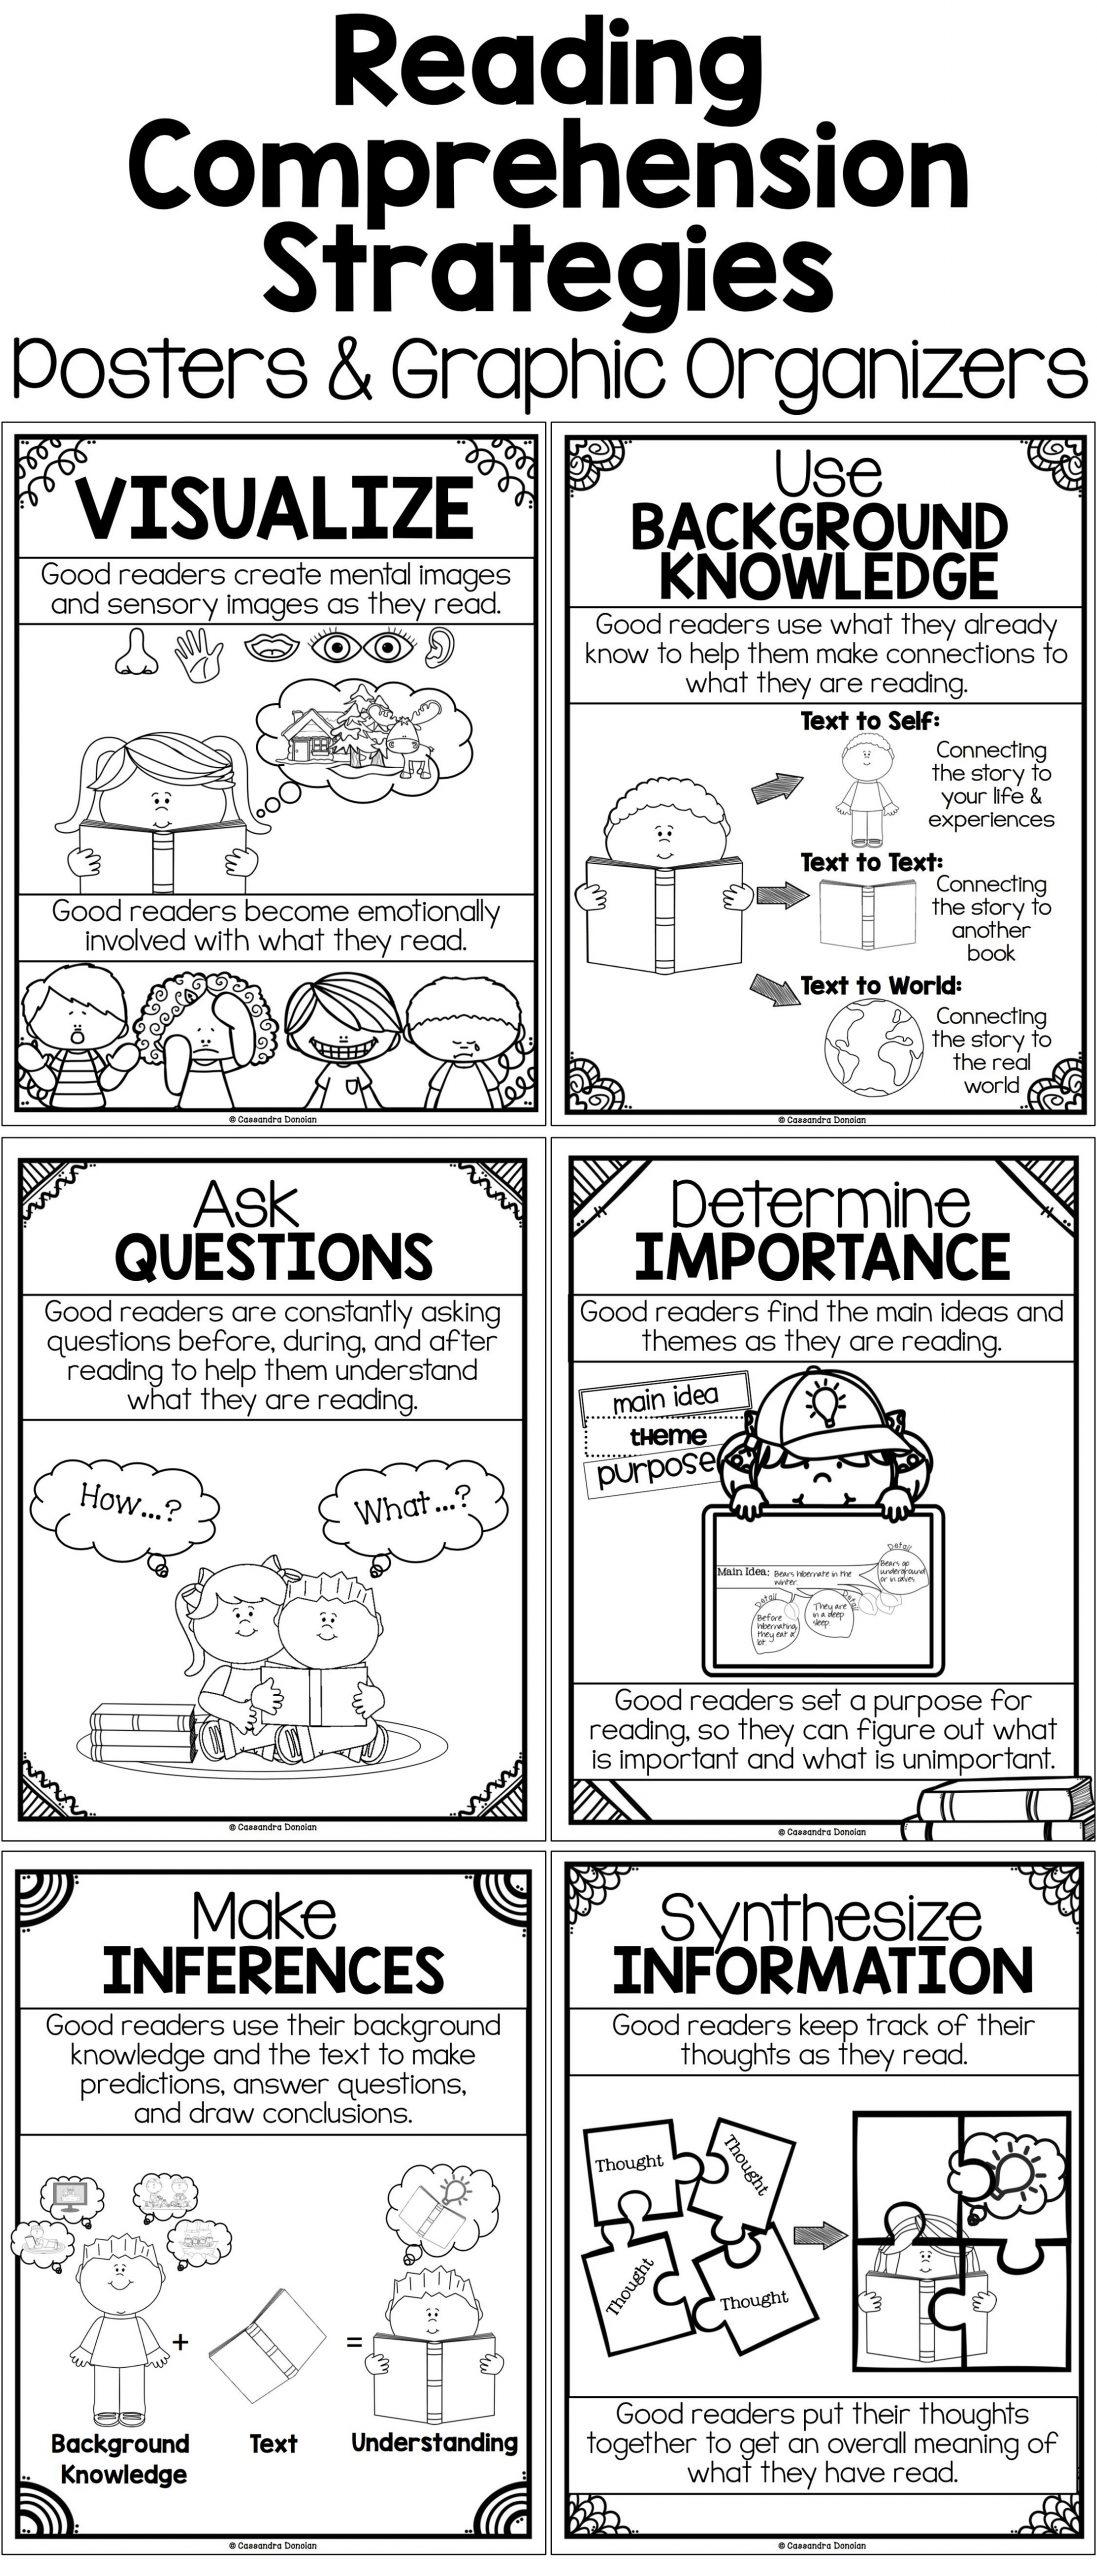 Reading Strategies For Kids Graphic Organizer